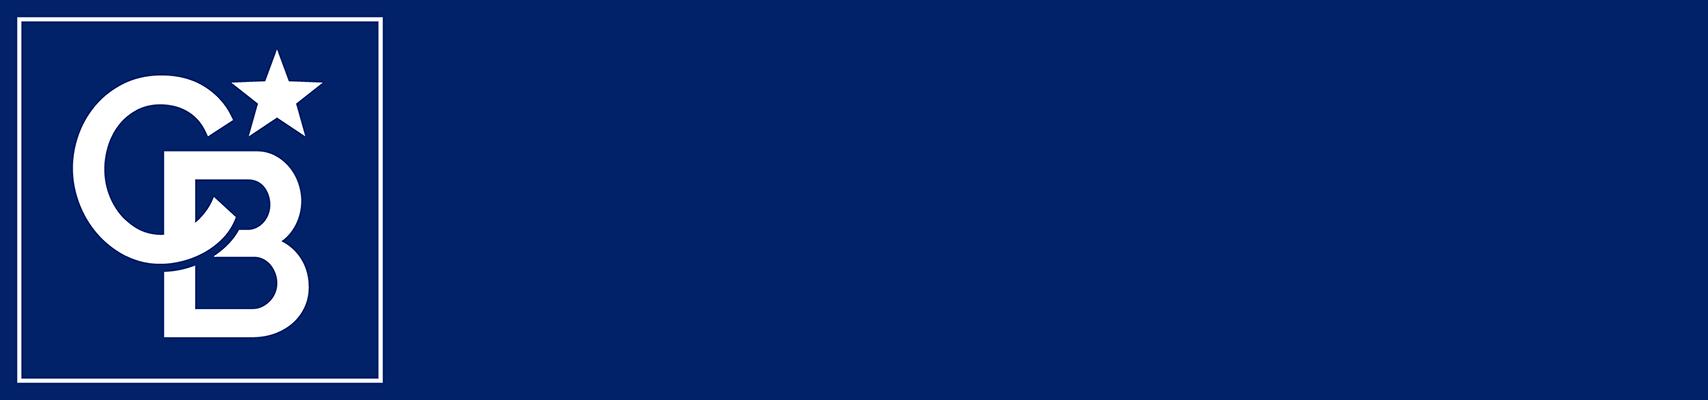 Gwyn Self - Coldwell Banker Select Logo